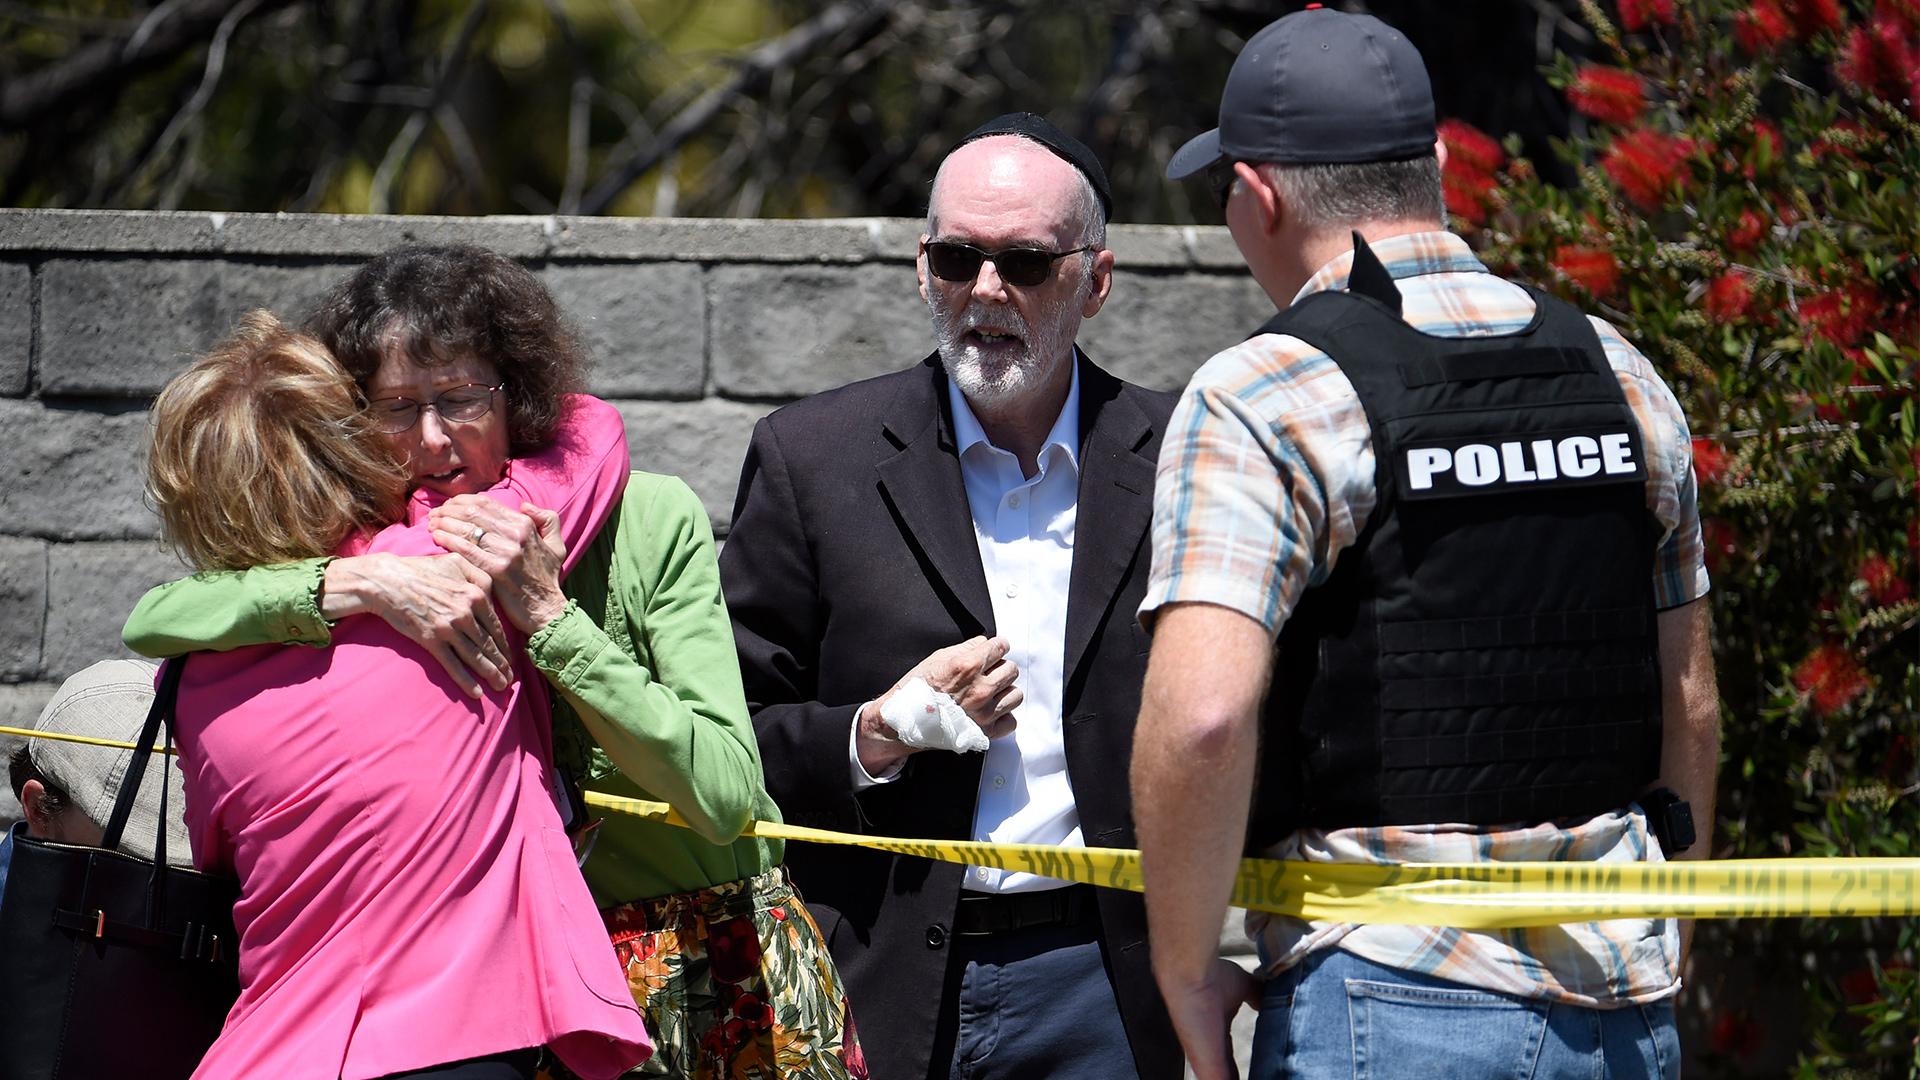 ap photo synagogue shooting california_1556399710217.jpg.jpg